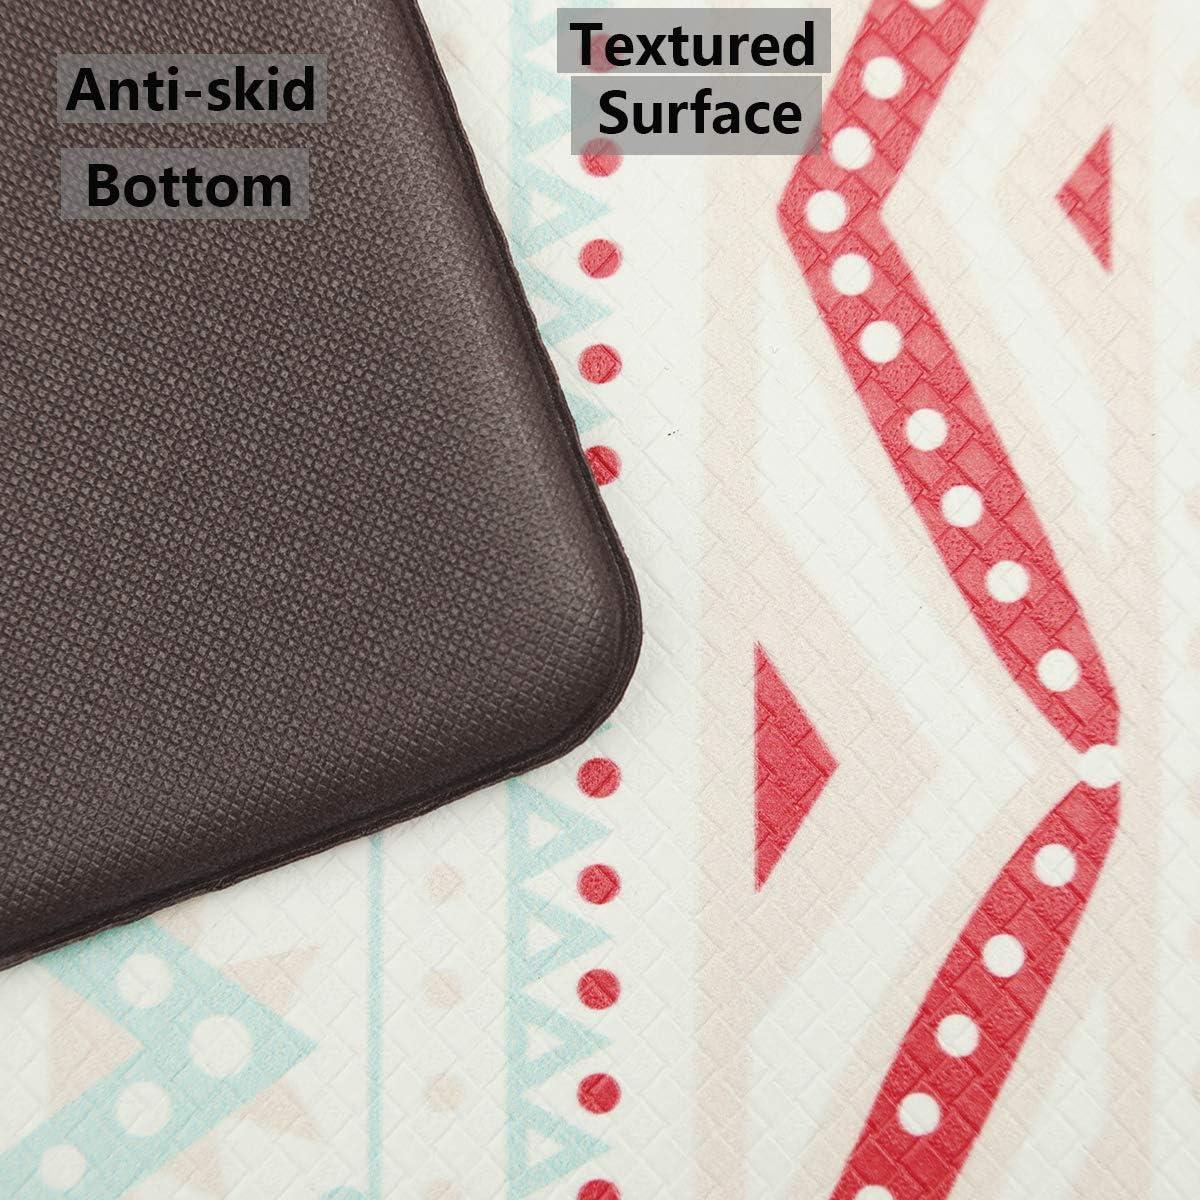 Bohemia SHACOS Anti Fatigue Kitchen Floor Mat Set of 2 Comfort Mat 10mm Thick PVC Foam Cushioned Standing Mats Kitchen Rug Waterproof Non Slip Wipe Clean 17.3x29+17.3x47 inch